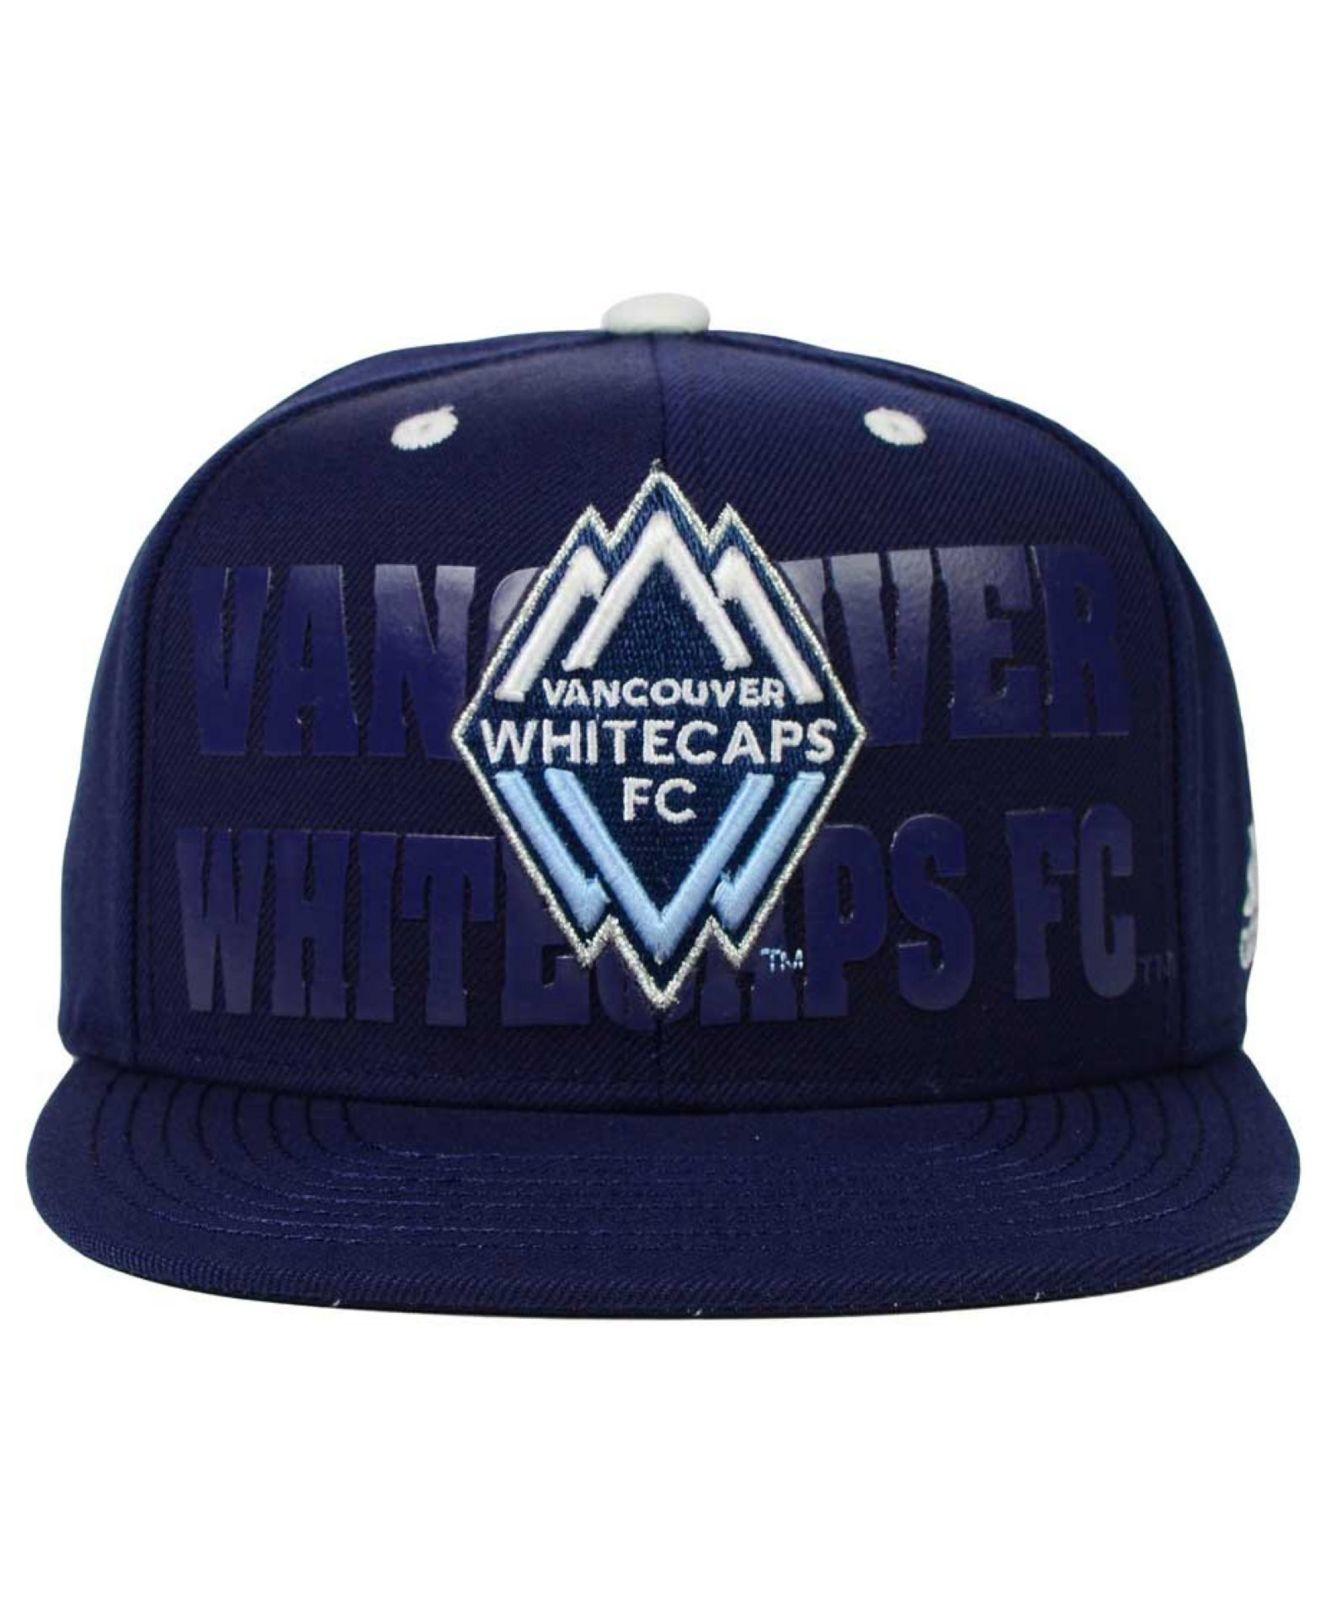 8de98cf1f92 Lyst - adidas Originals Vancouver Whitecaps Fc Academy Snapback Cap ...